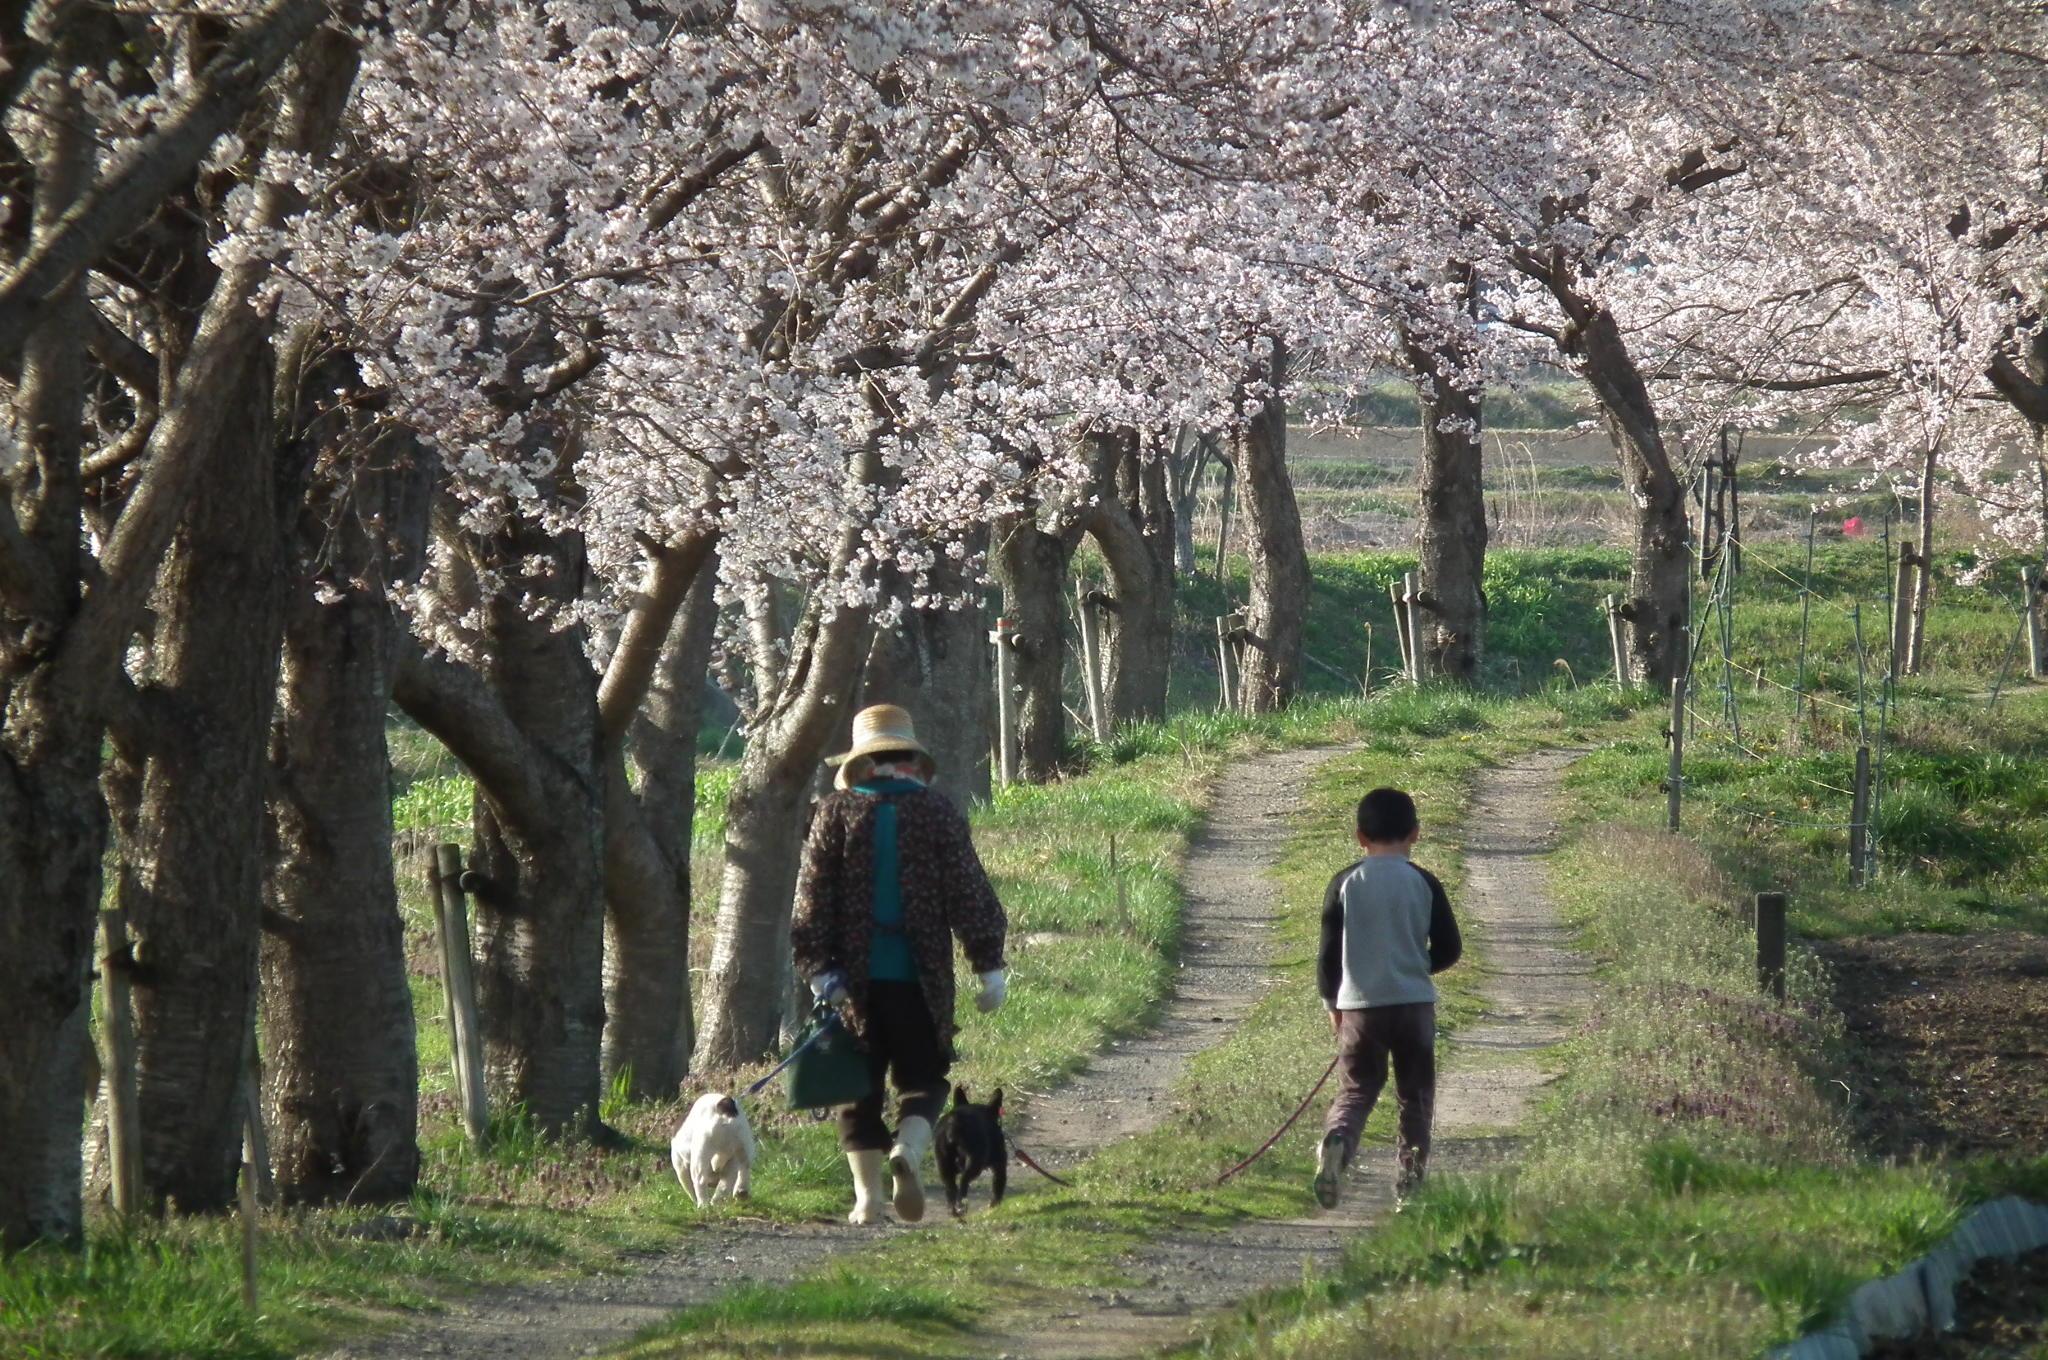 FileWalk Under The Cherry Tree Muko River